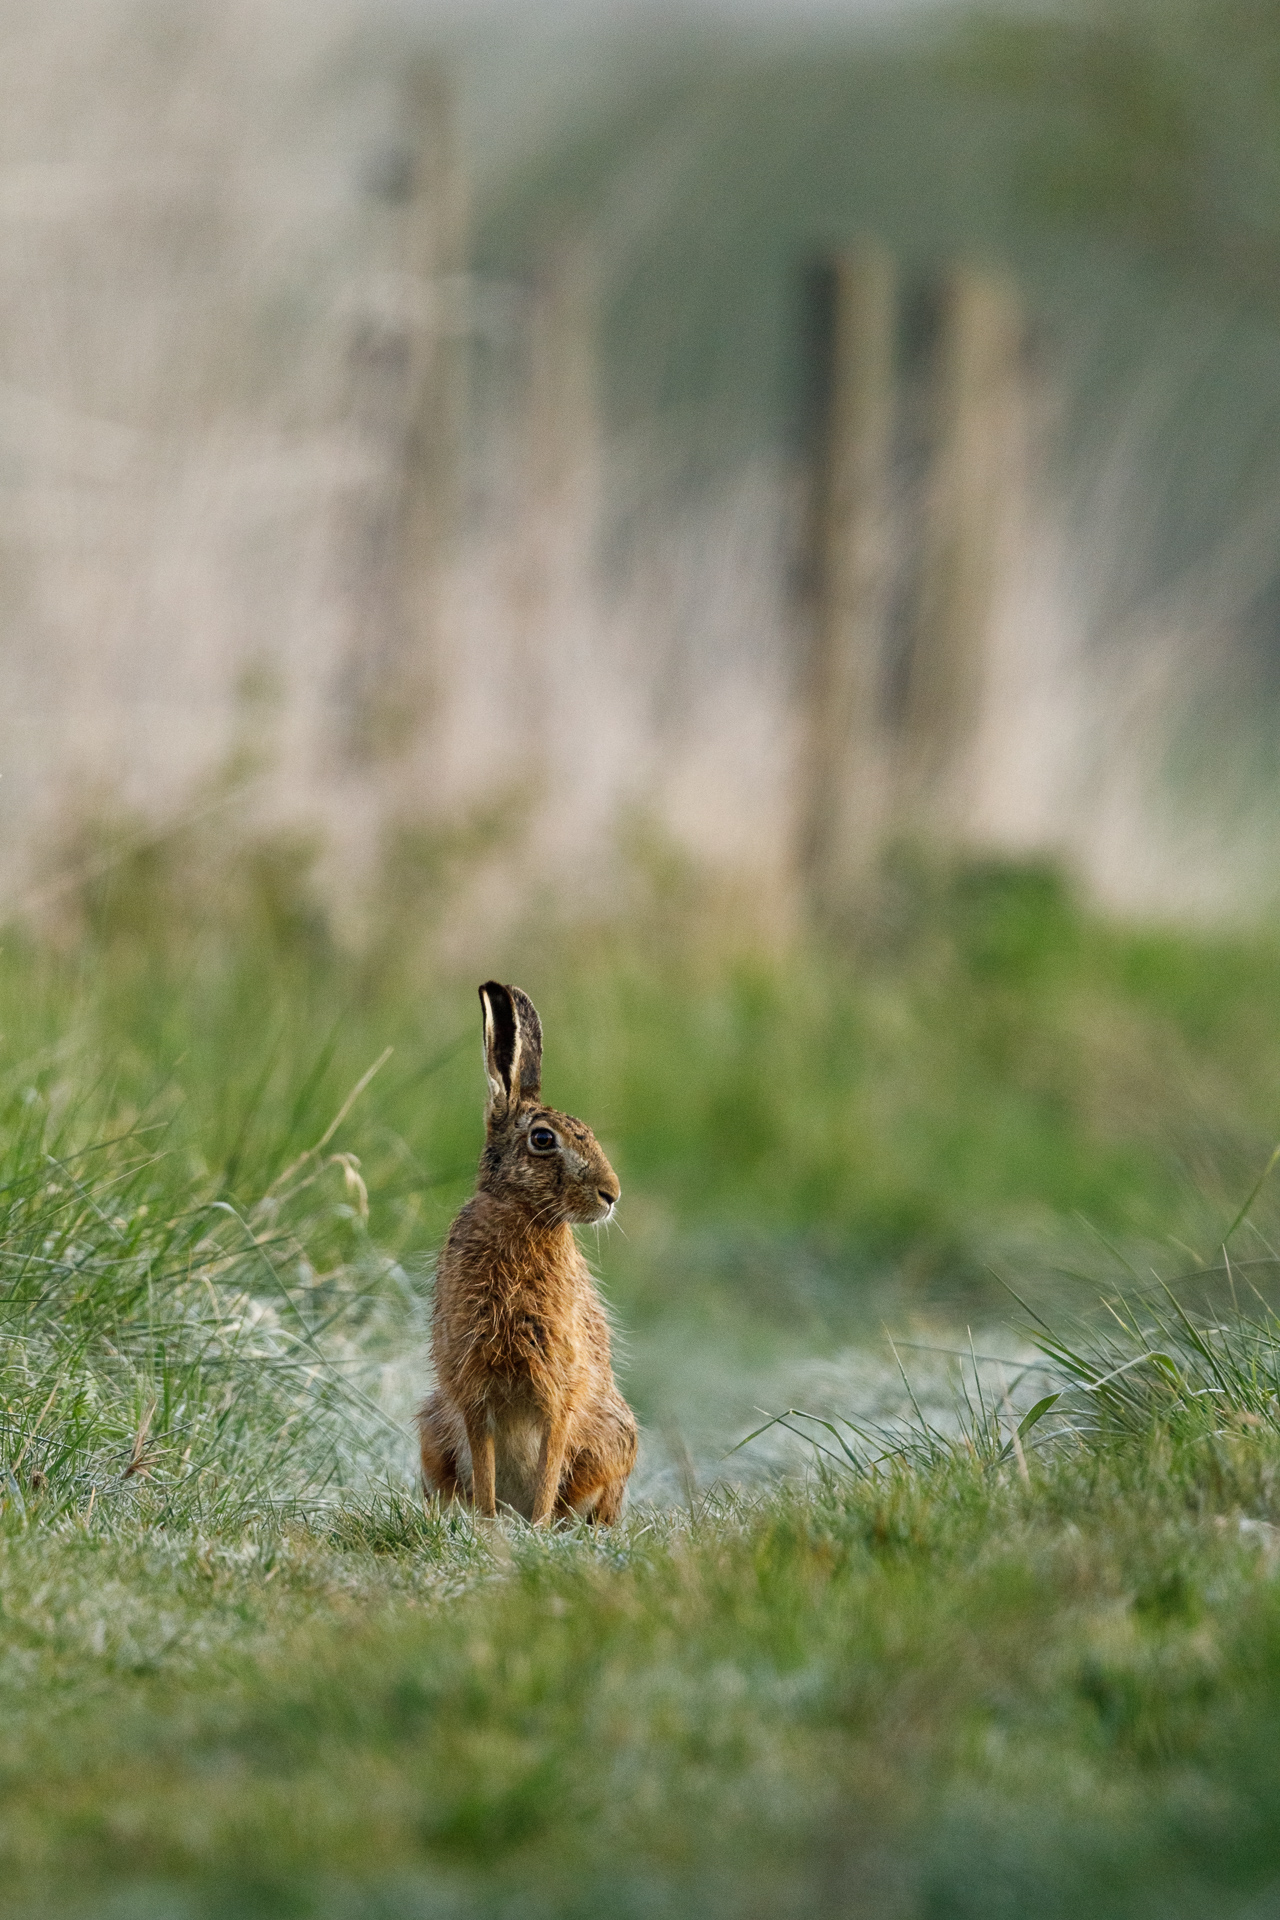 Ein Feldhase (Lepus europaeus) beobachtet seine Umgebung / Foto: Andreas Sebald